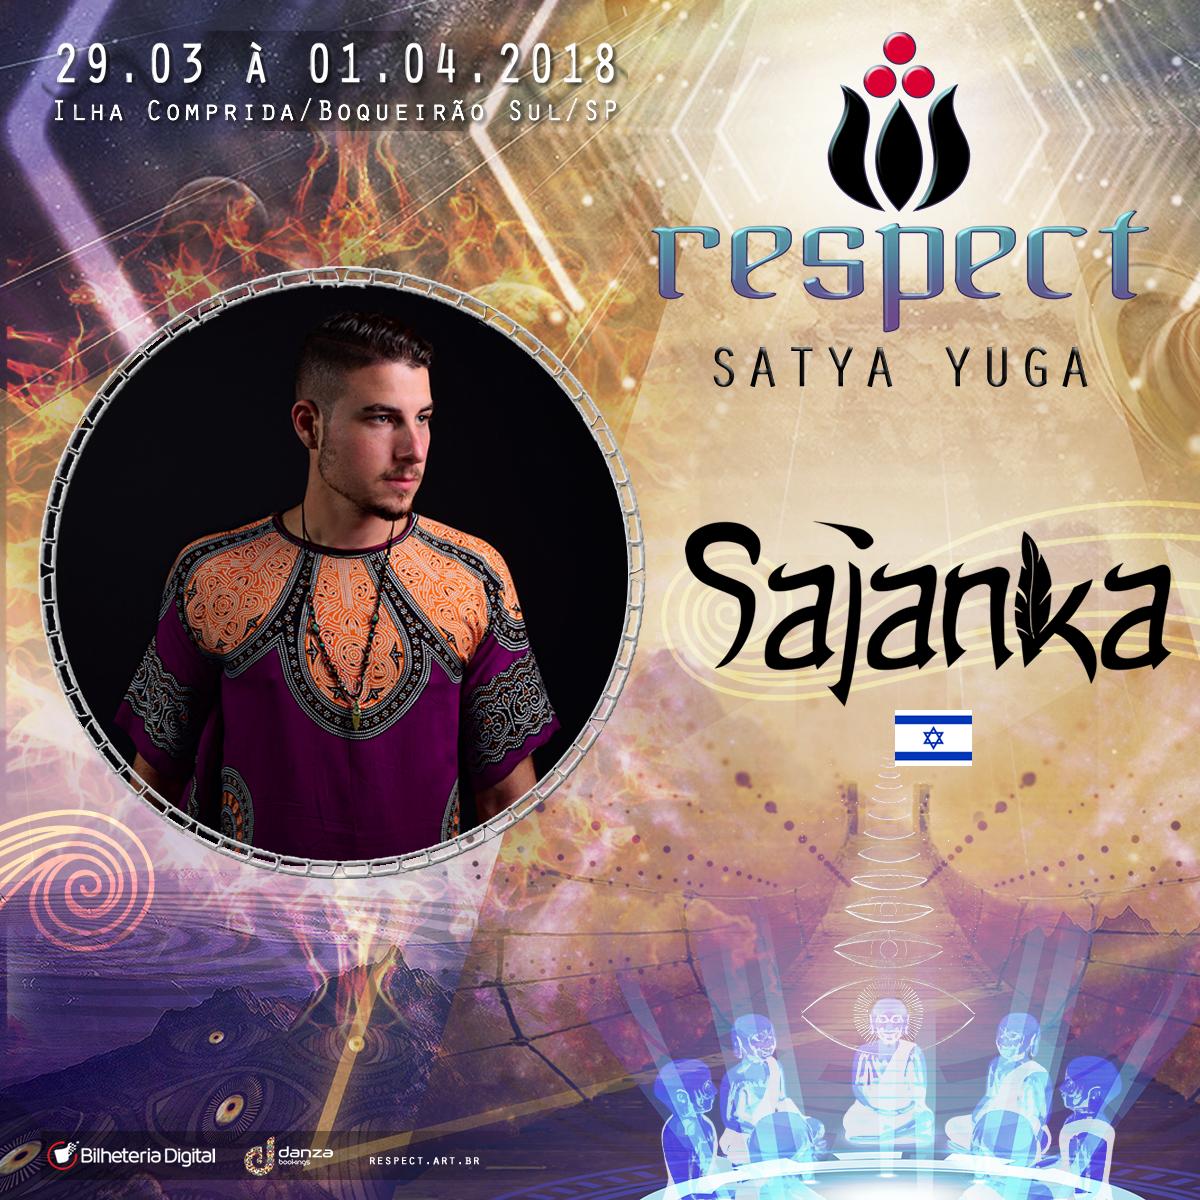 Sajanka (Israel) @ Artista Confirmado Respect Festival 2018